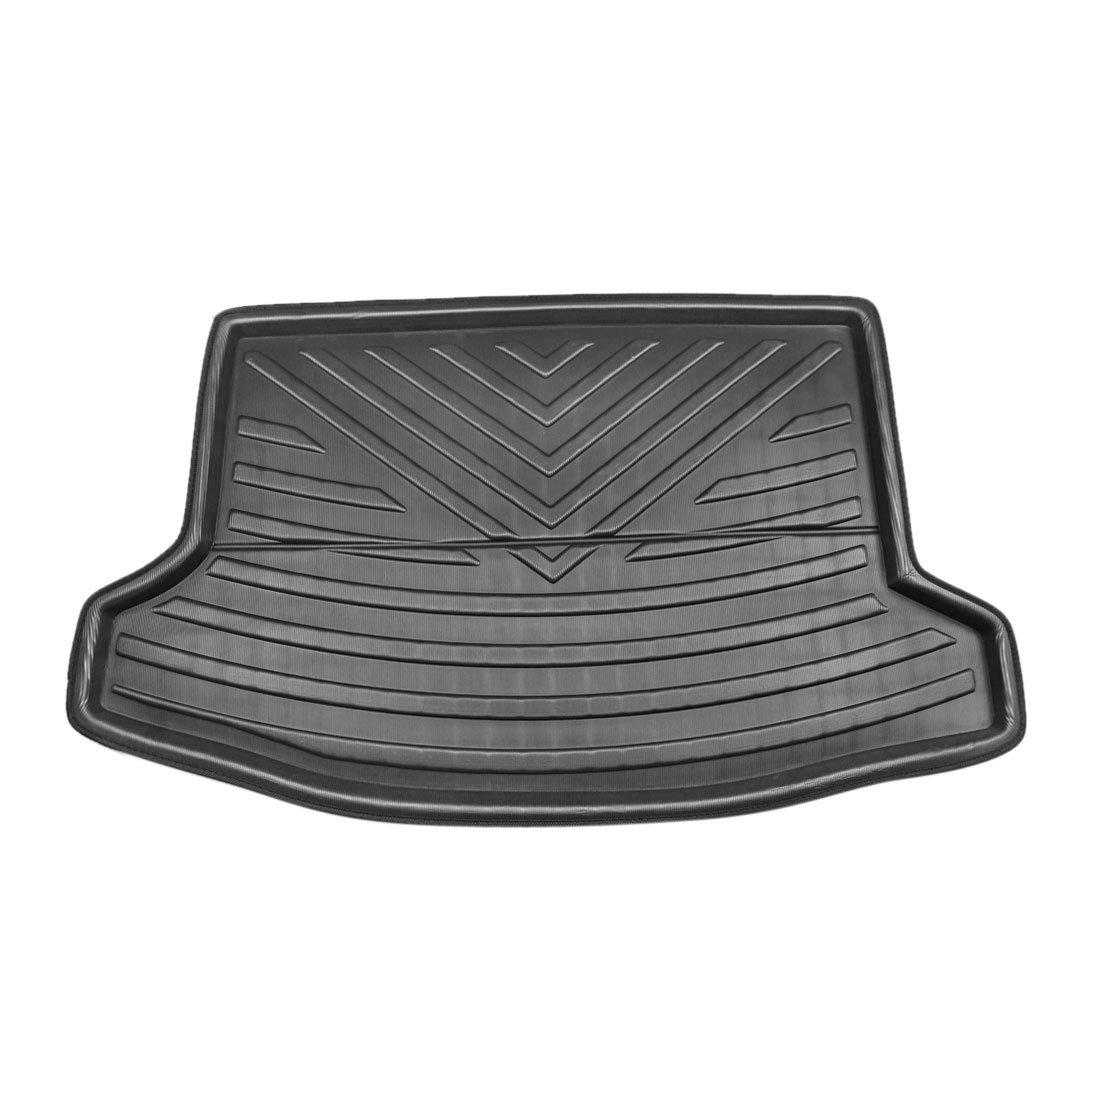 X AUTOHAUX Black Rear Trunk Boot Liner Cargo Mat Floor Tray for Subaru XV Crosstrek 12-17